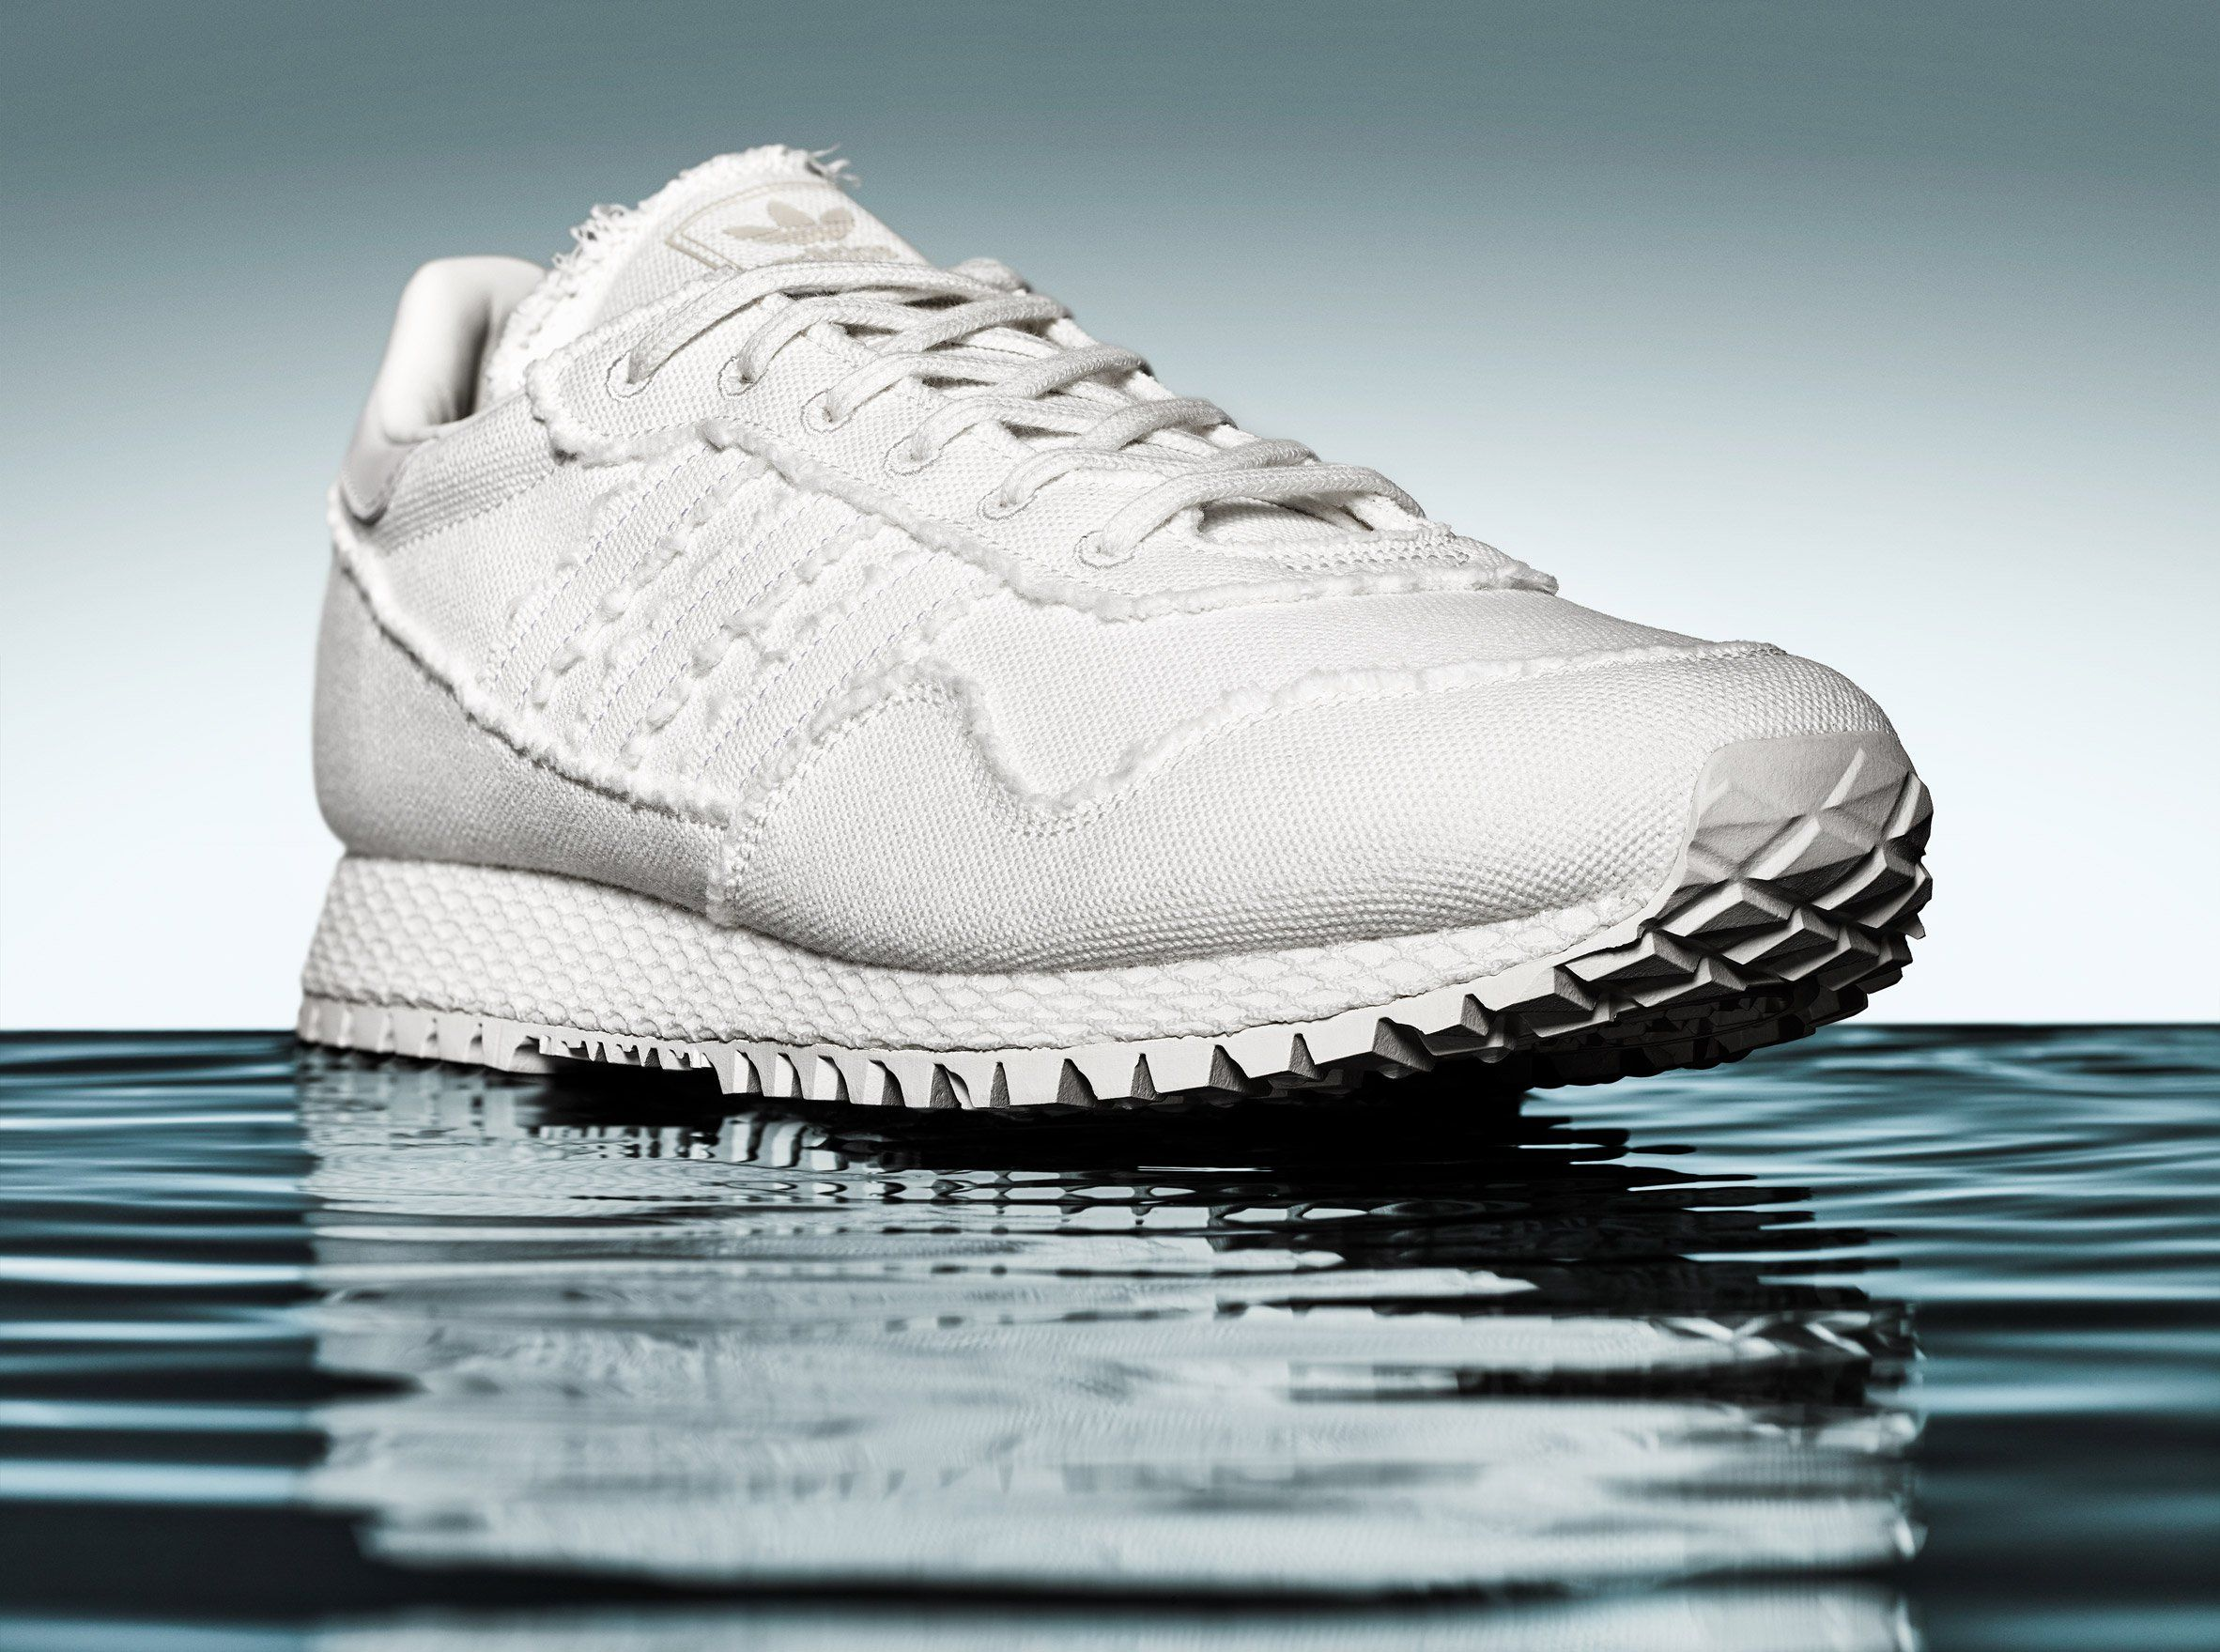 Daniel Arsham bases all white Adidas trainers on